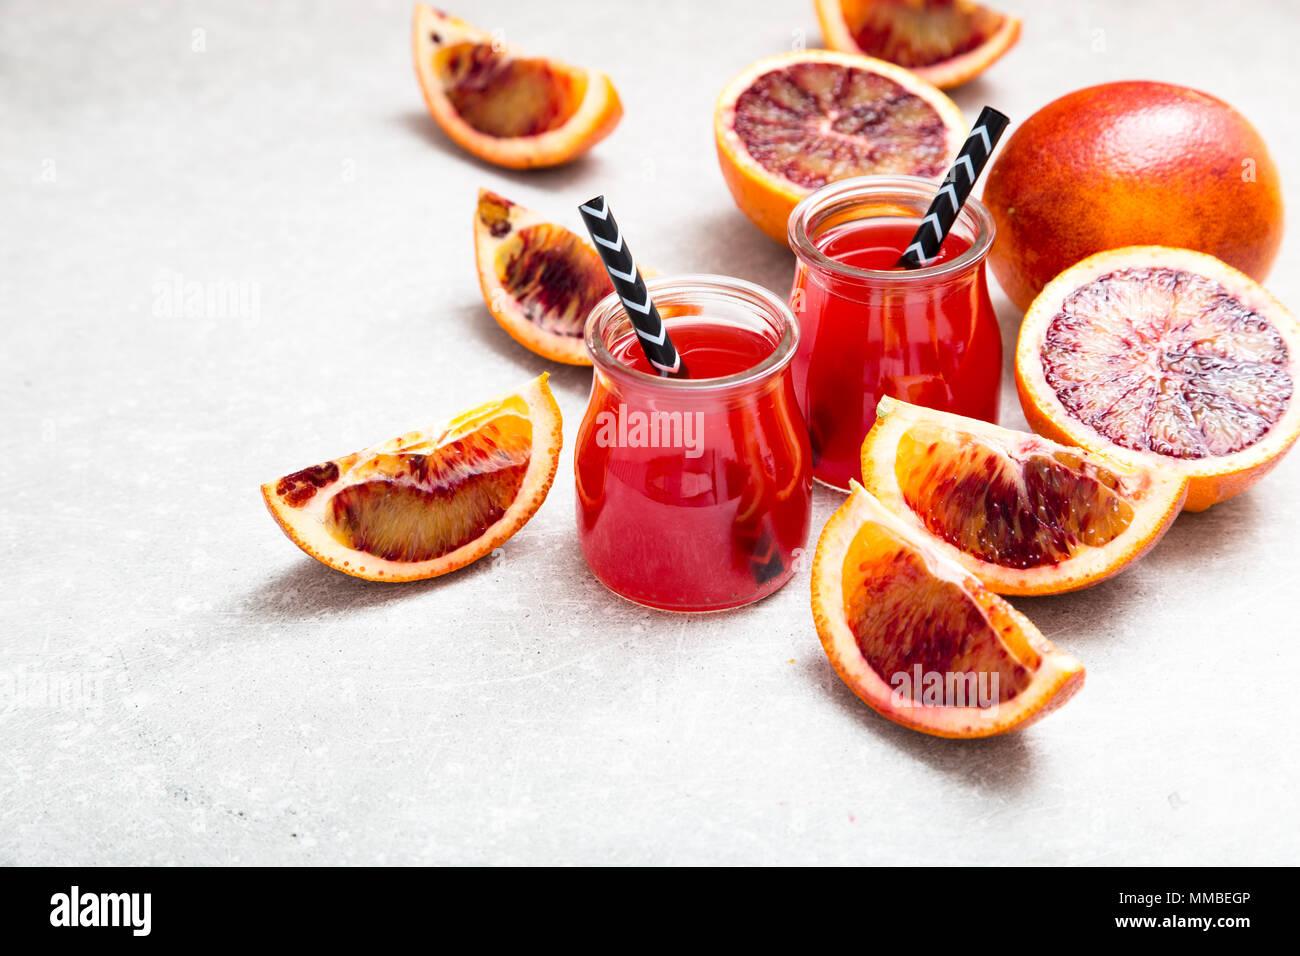 blood orange juice. red orange juice with orange slice. Healthy drink. - Stock Image